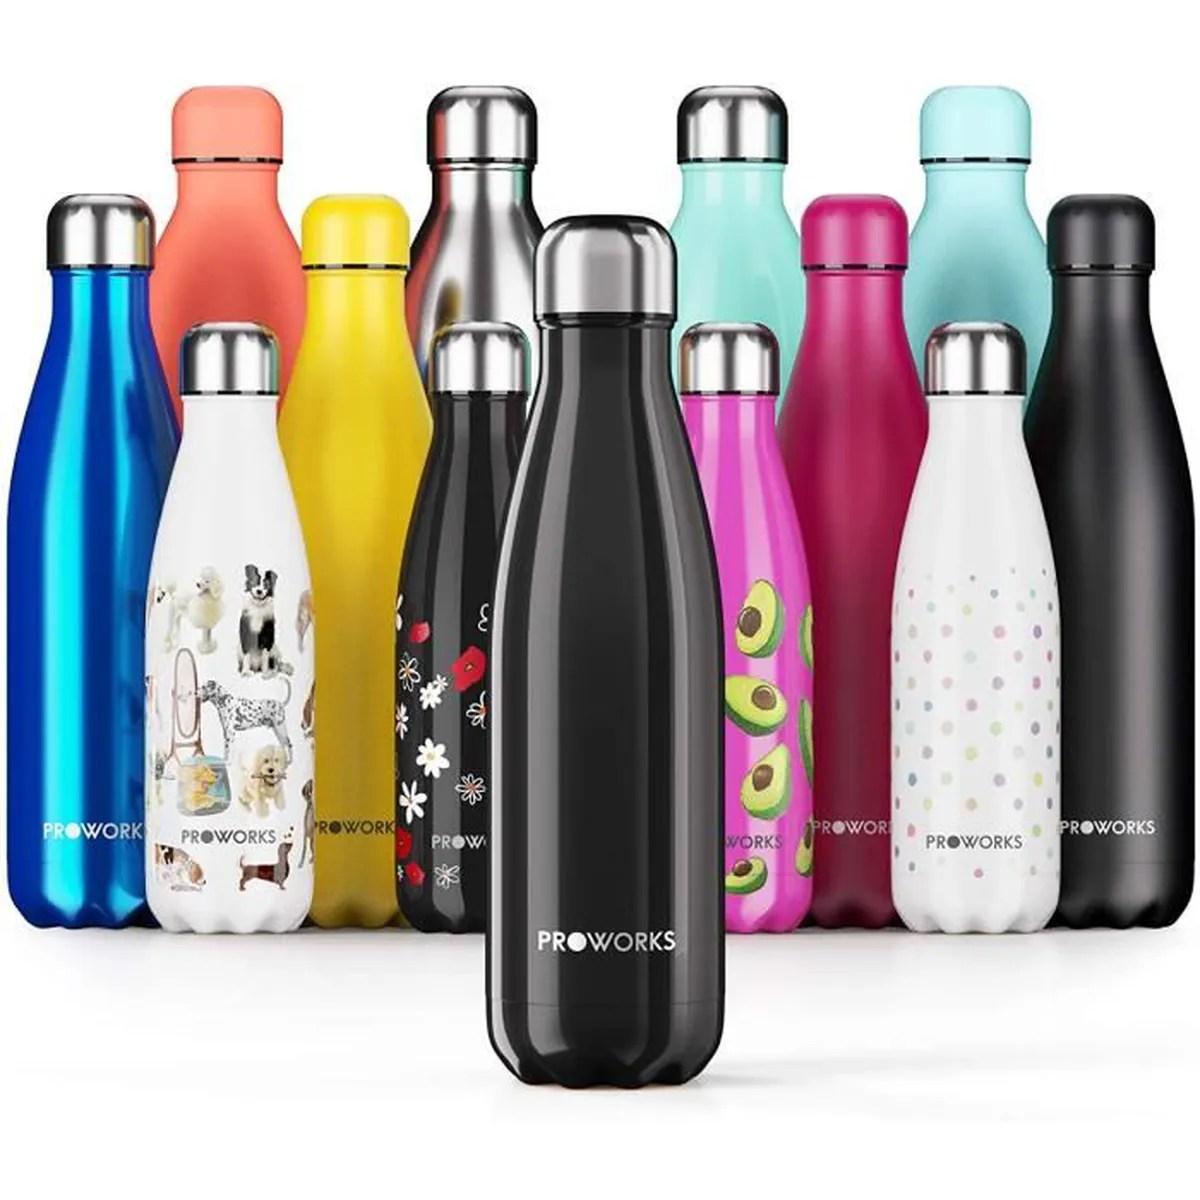 proworks bouteille d eau isotherme